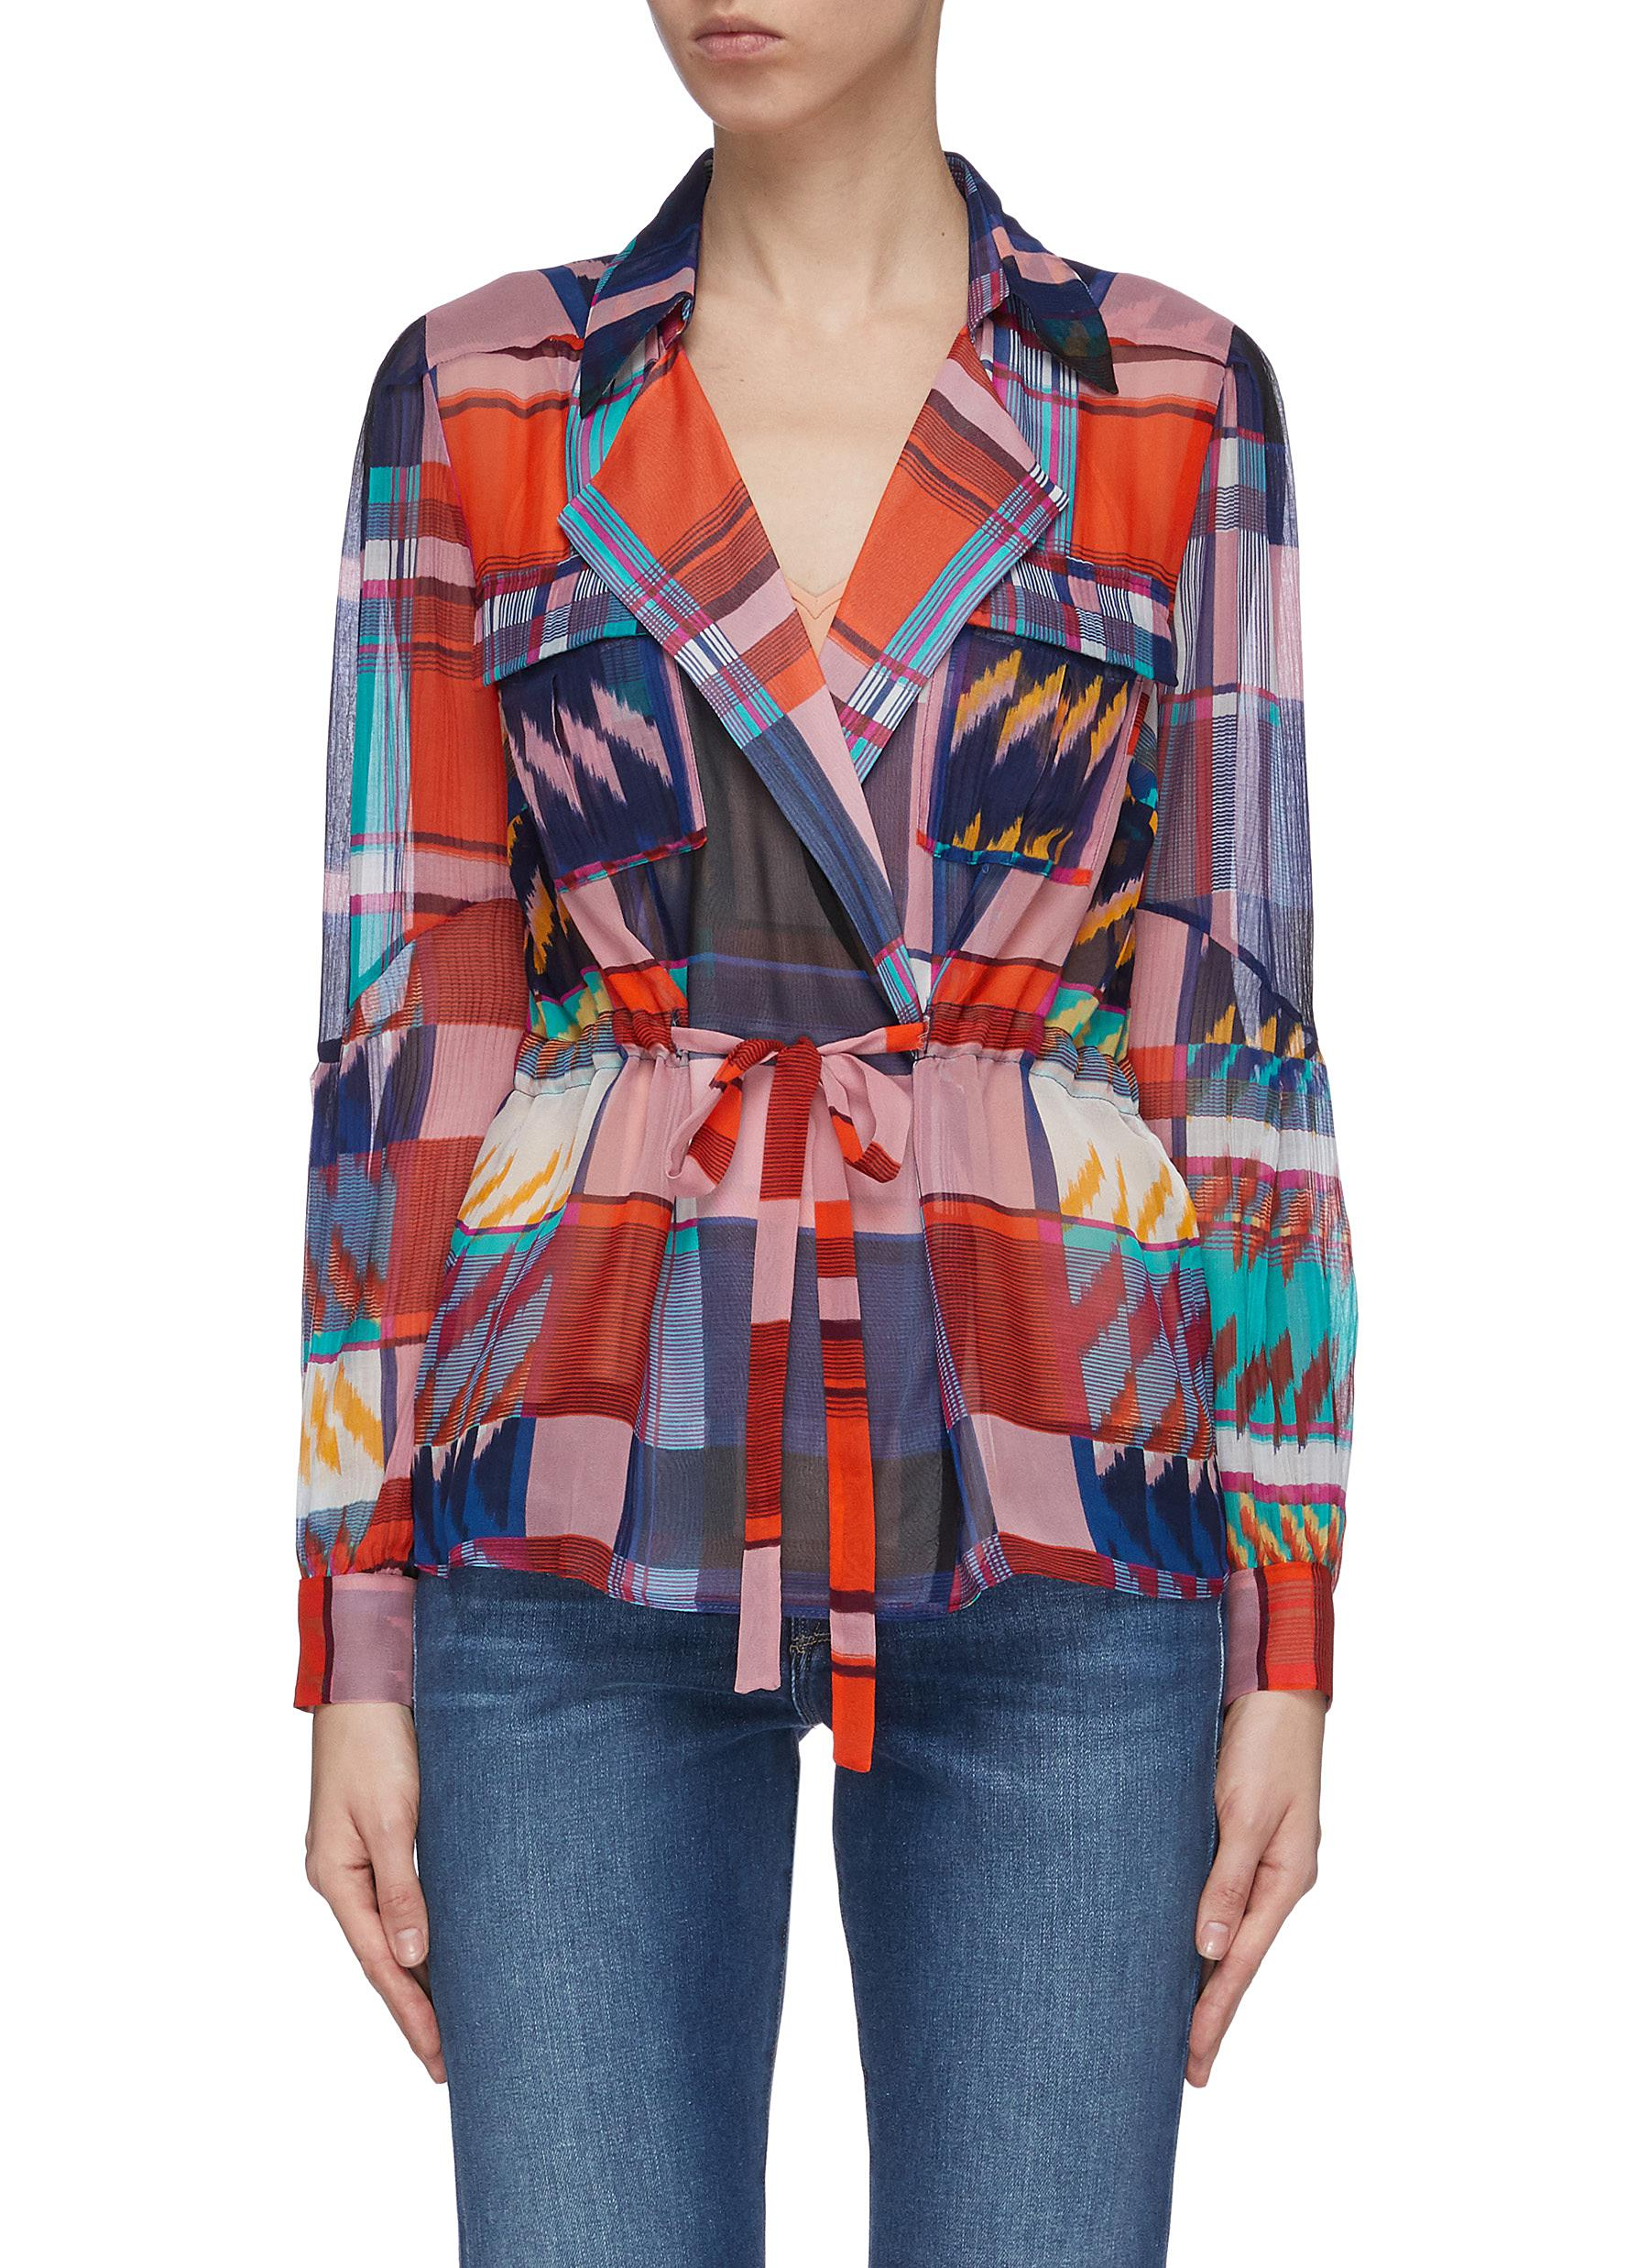 Joanna mix print pleated drawstring silk chiffon blouse by Diane Von Furstenberg